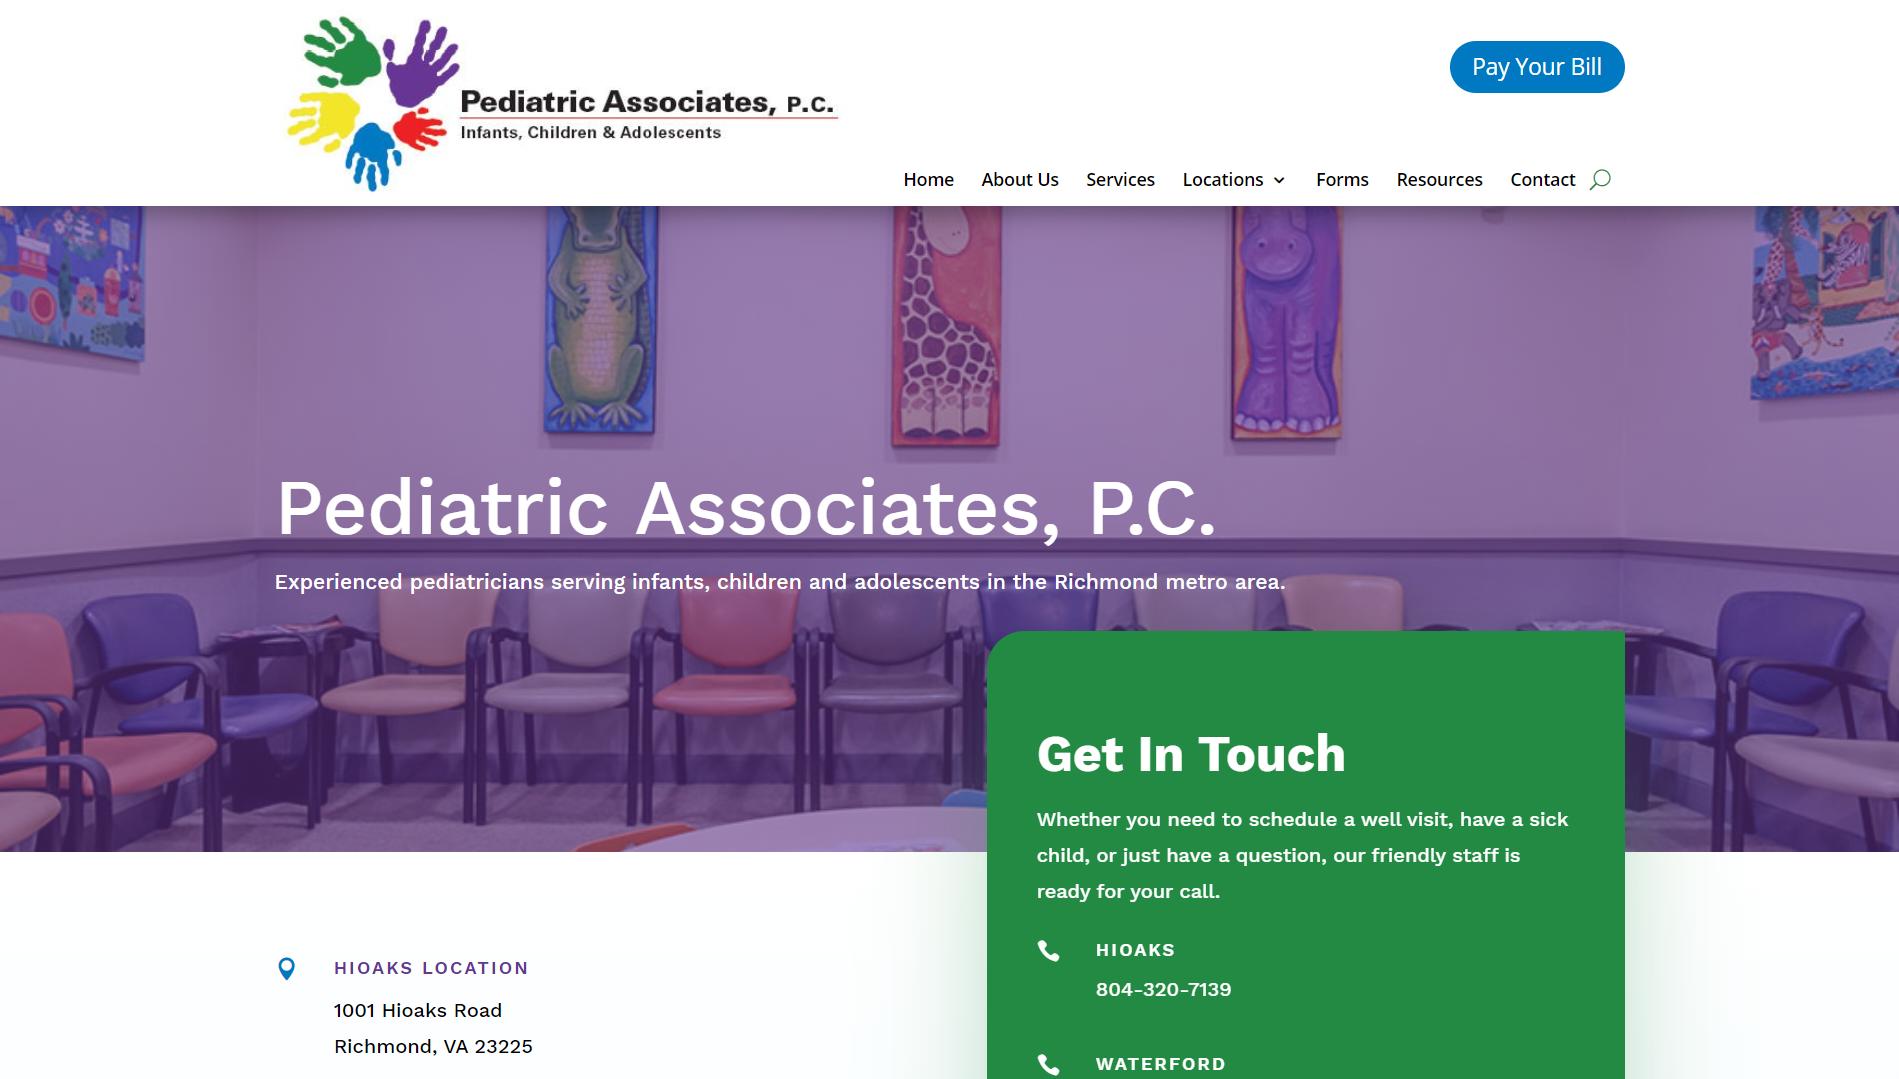 Pediatric Associates Website Screenshot